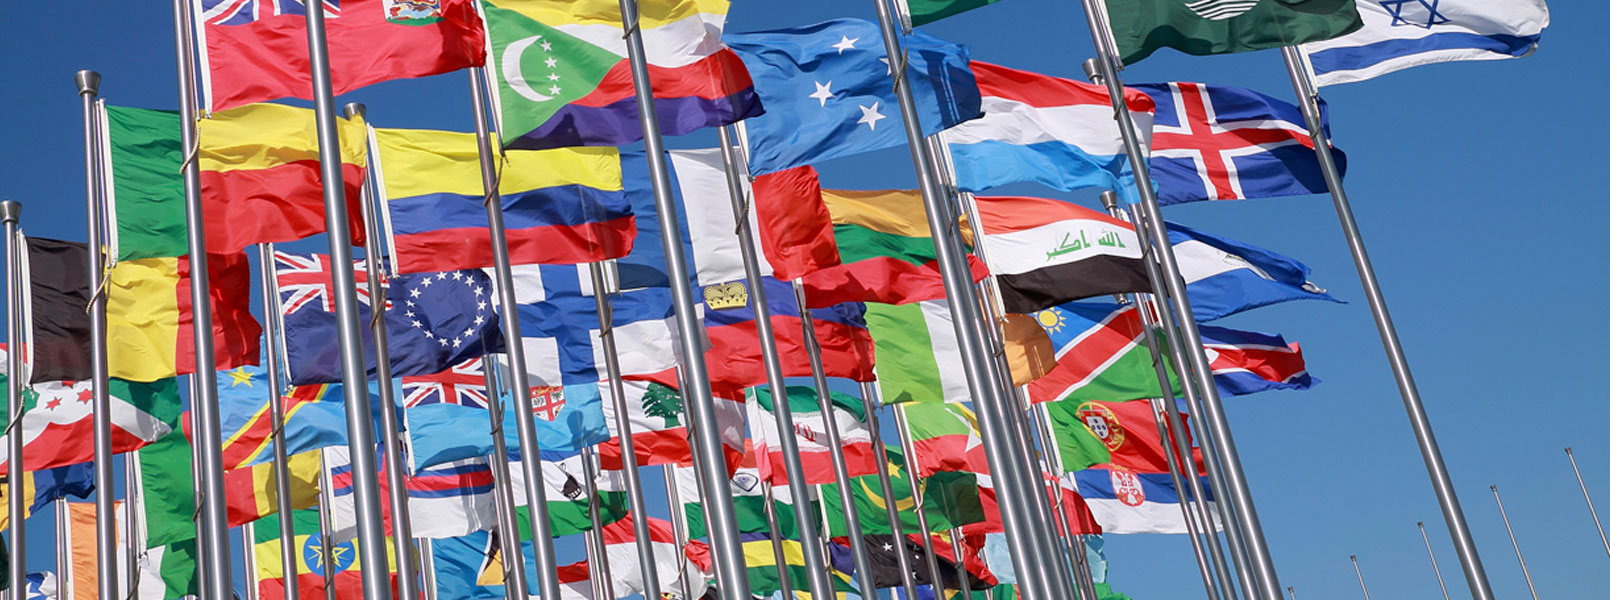 Flags_W.jpg